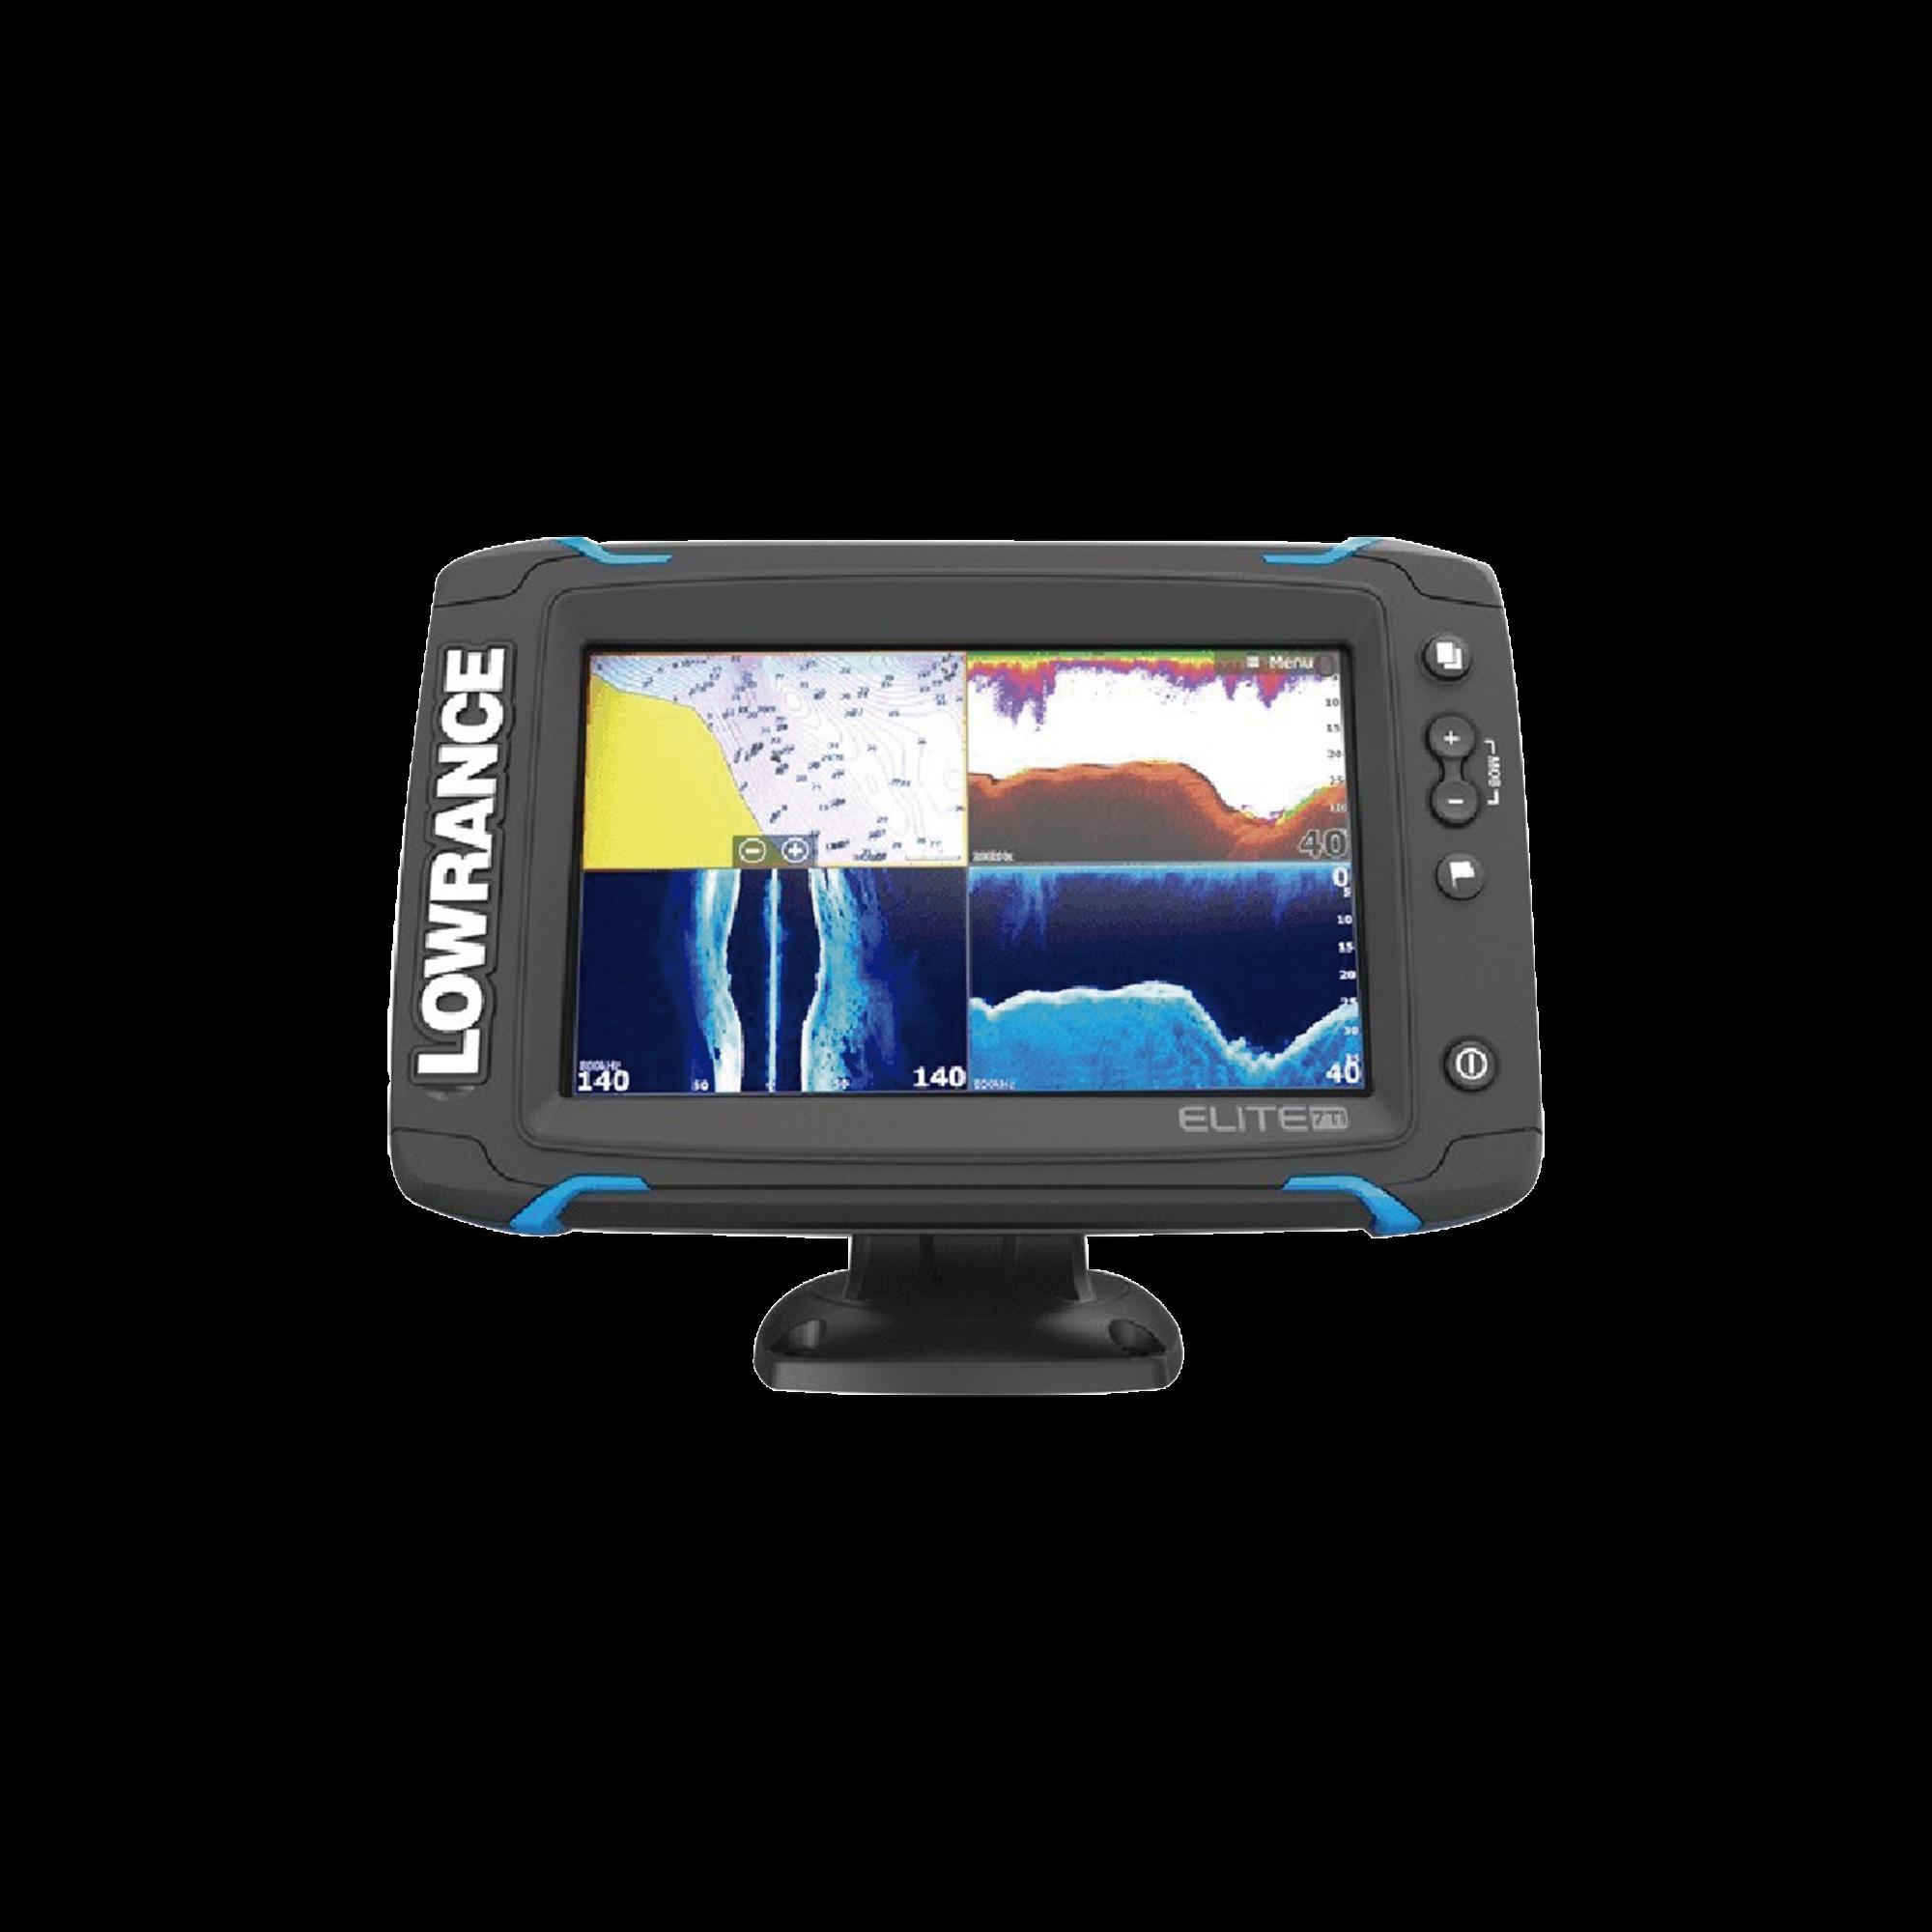 Elite-7 Ti Fishfinder / Chartplotter de 7 pulgadas con pantalla LED retroiluminada de alto brillo con tecnología CHIRP, DownScan ? y StructureScan ?, incorporada. Incluye transducer total scan